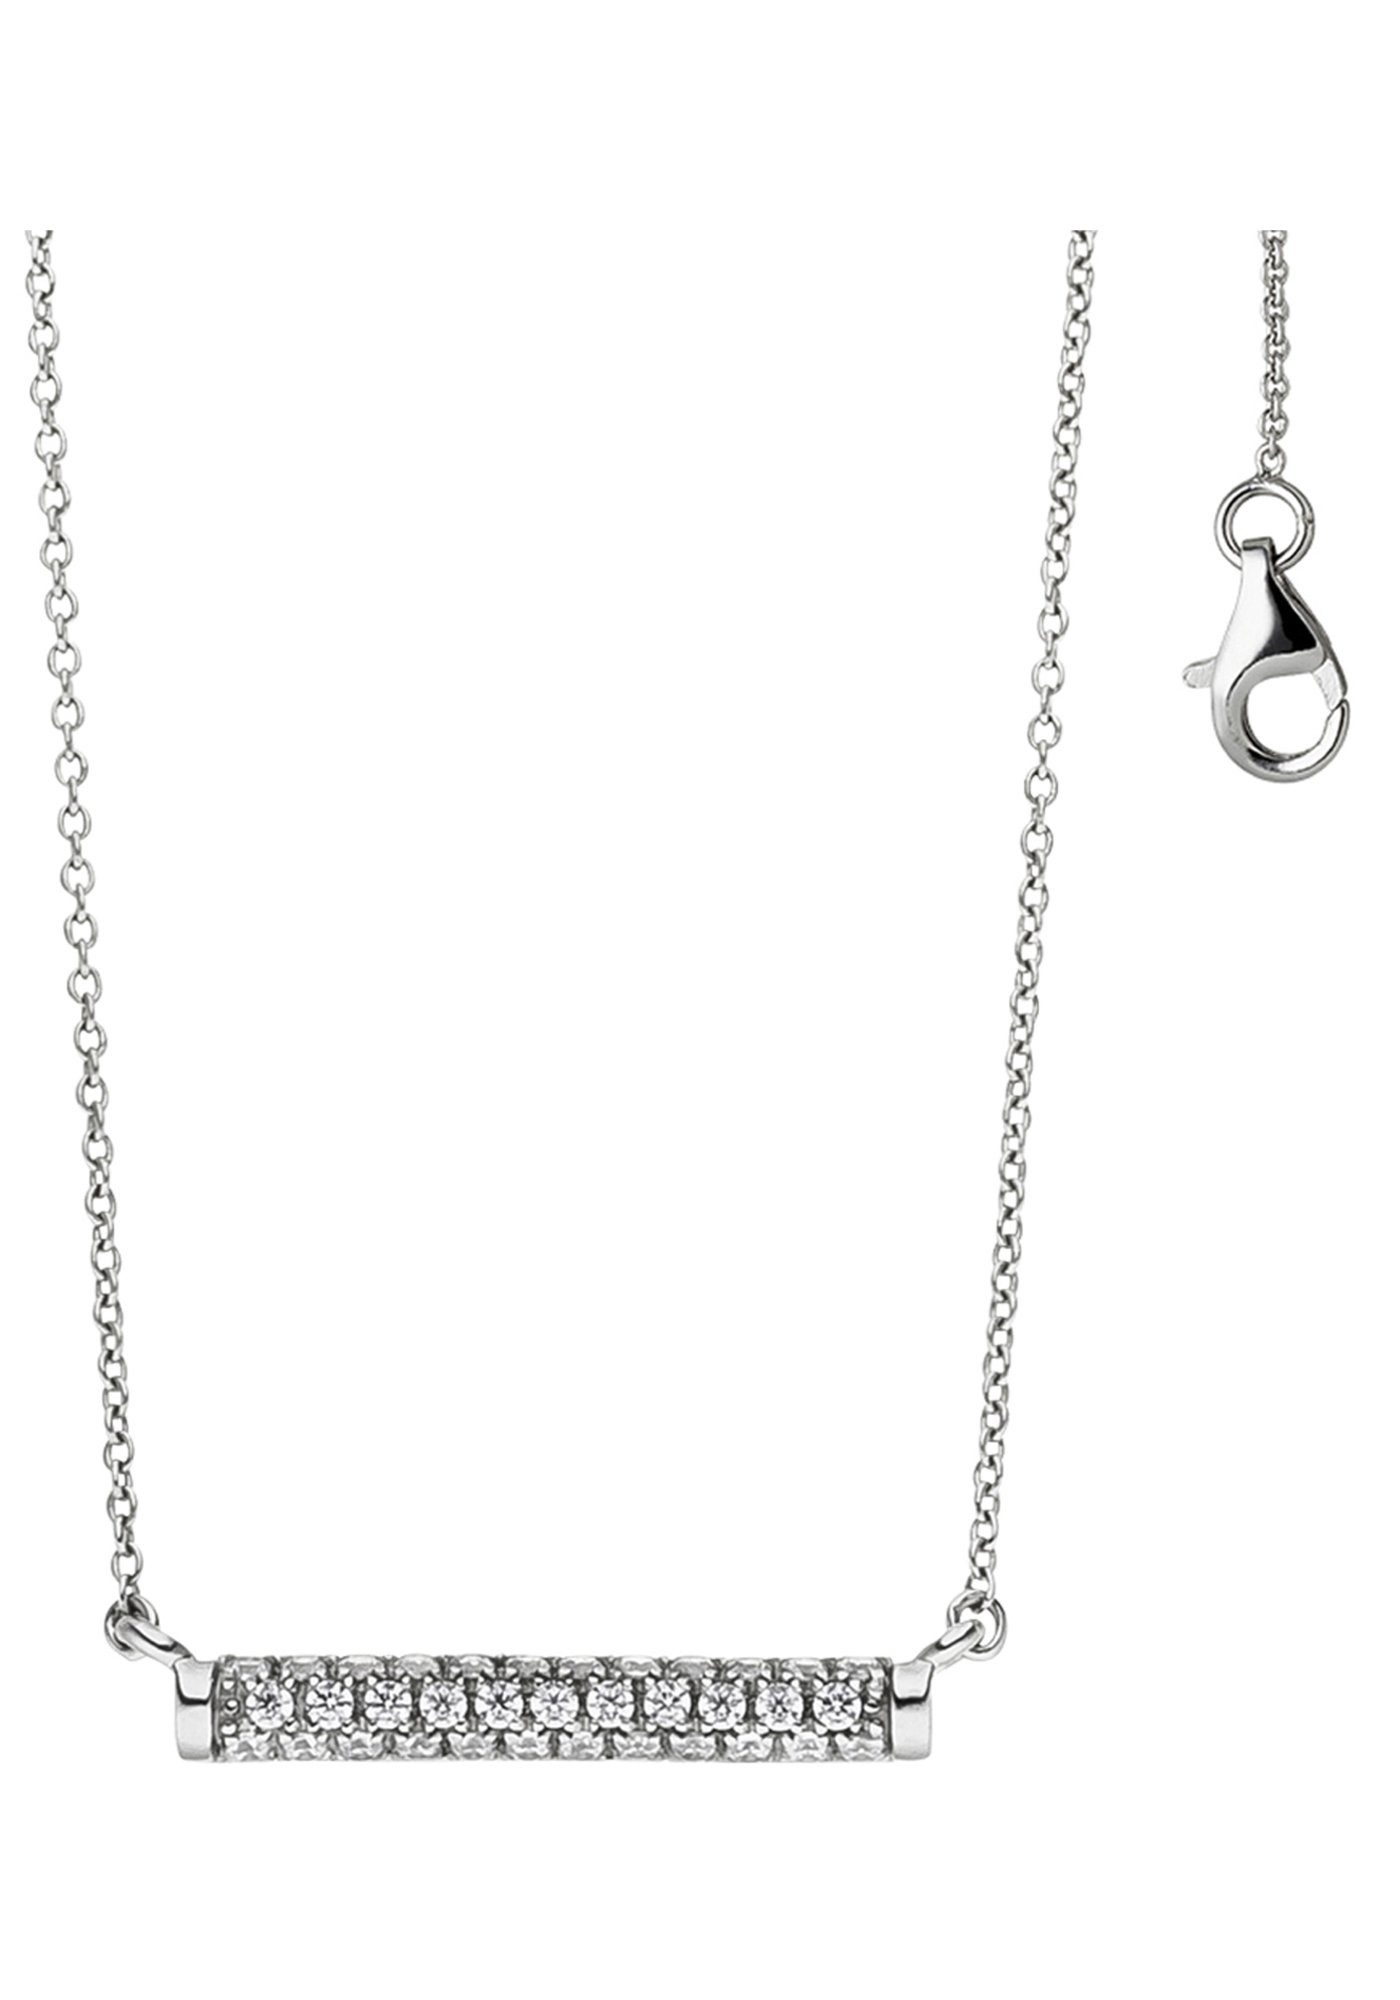 JOBO Collier 925 Silber mit Zirkonia 45 cm